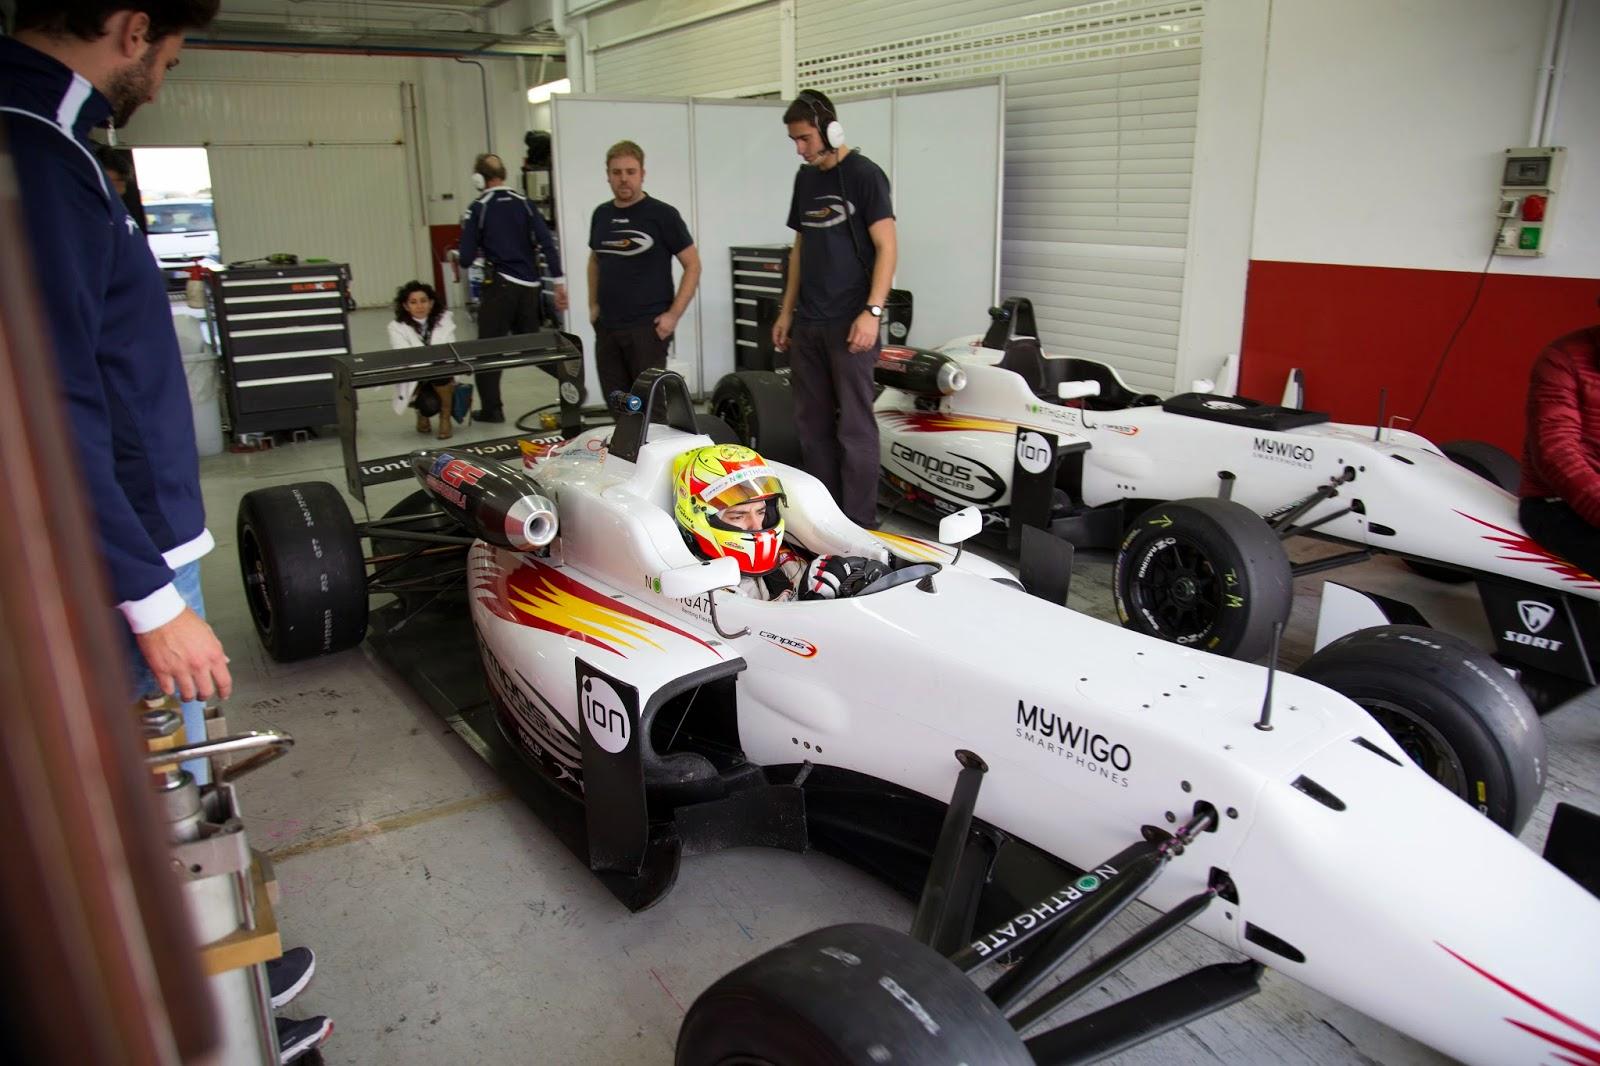 F3, F1, Formula 1, EuroFormula Open, Spain, Valencia, Cheste